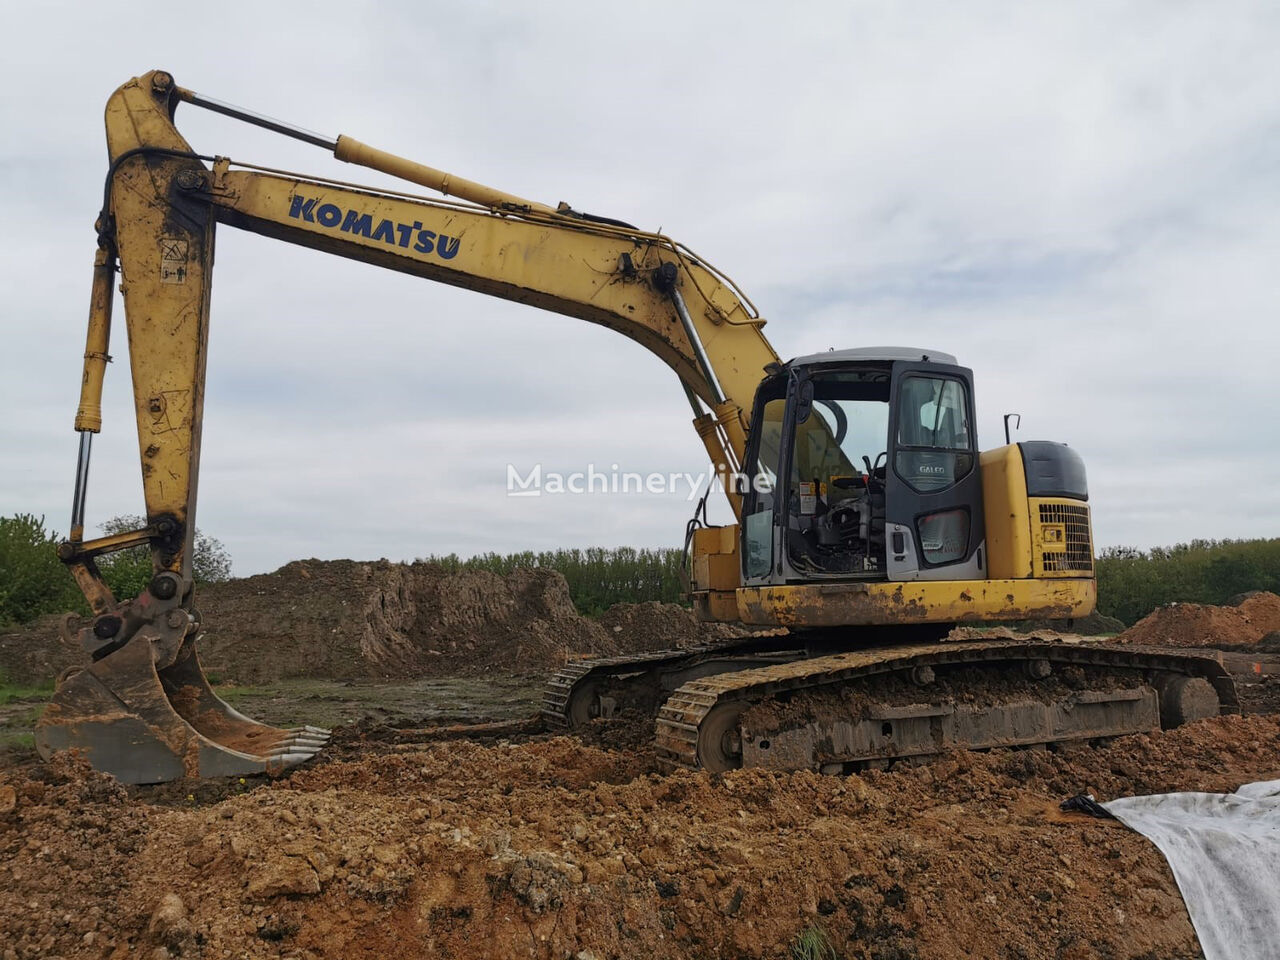 KOMATSU PC 228 USLC tracked excavator